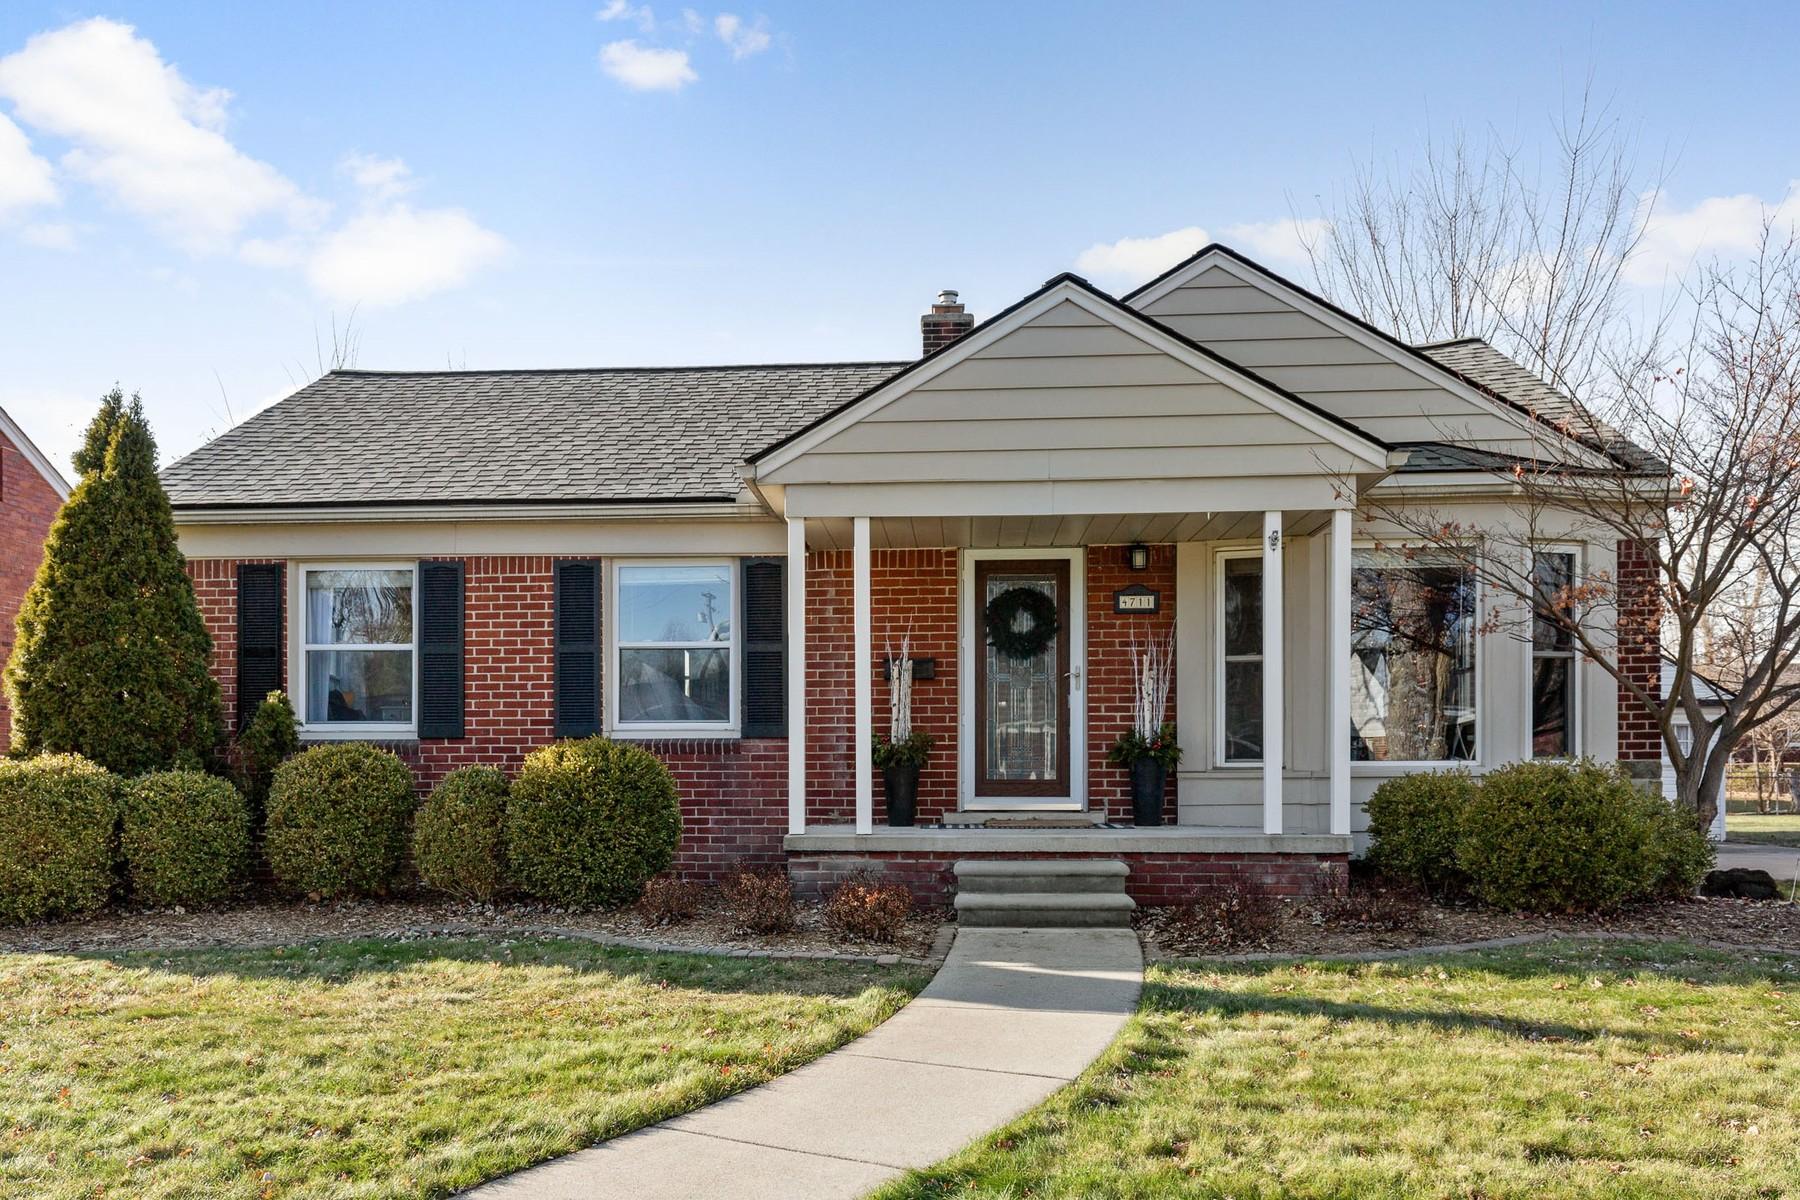 Single Family Homes for Active at Royal Oak 4711 Robinwood Avenue Royal Oak, Michigan 48073 United States